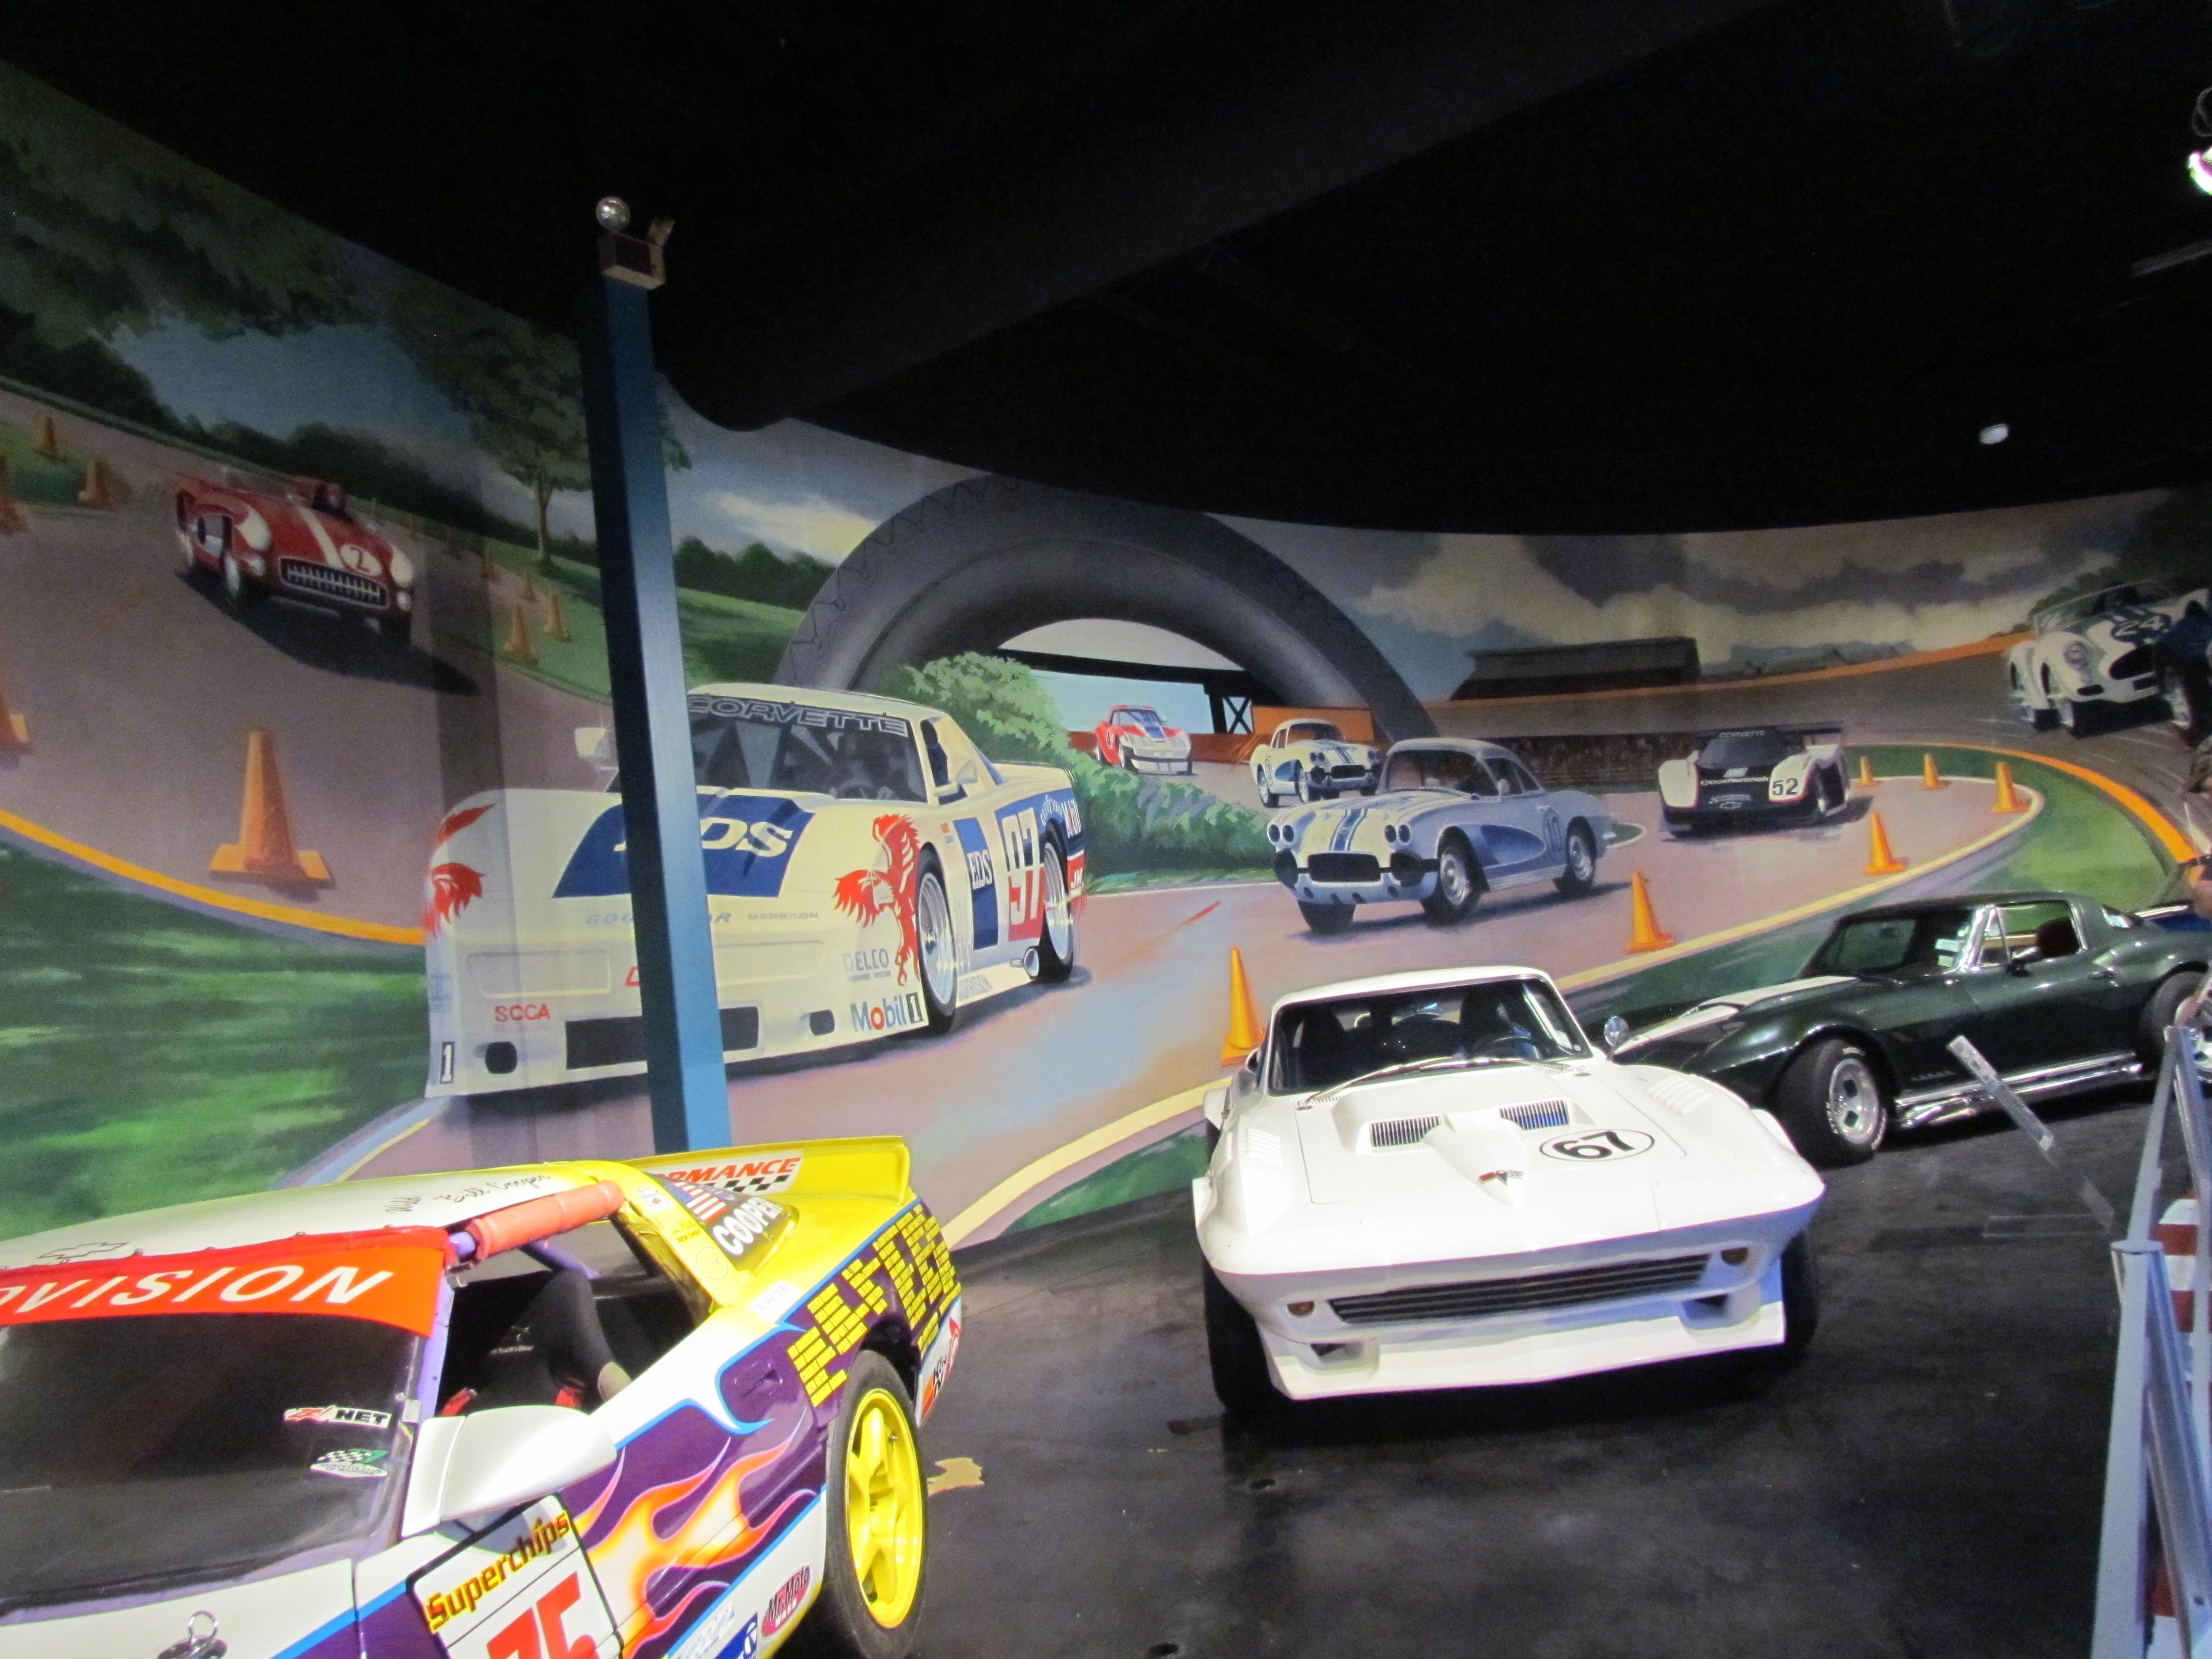 Chevrolet, Louis to Le Mans: Corvette museum celebrates the bow-tie brand's racing history, ClassicCars.com Journal